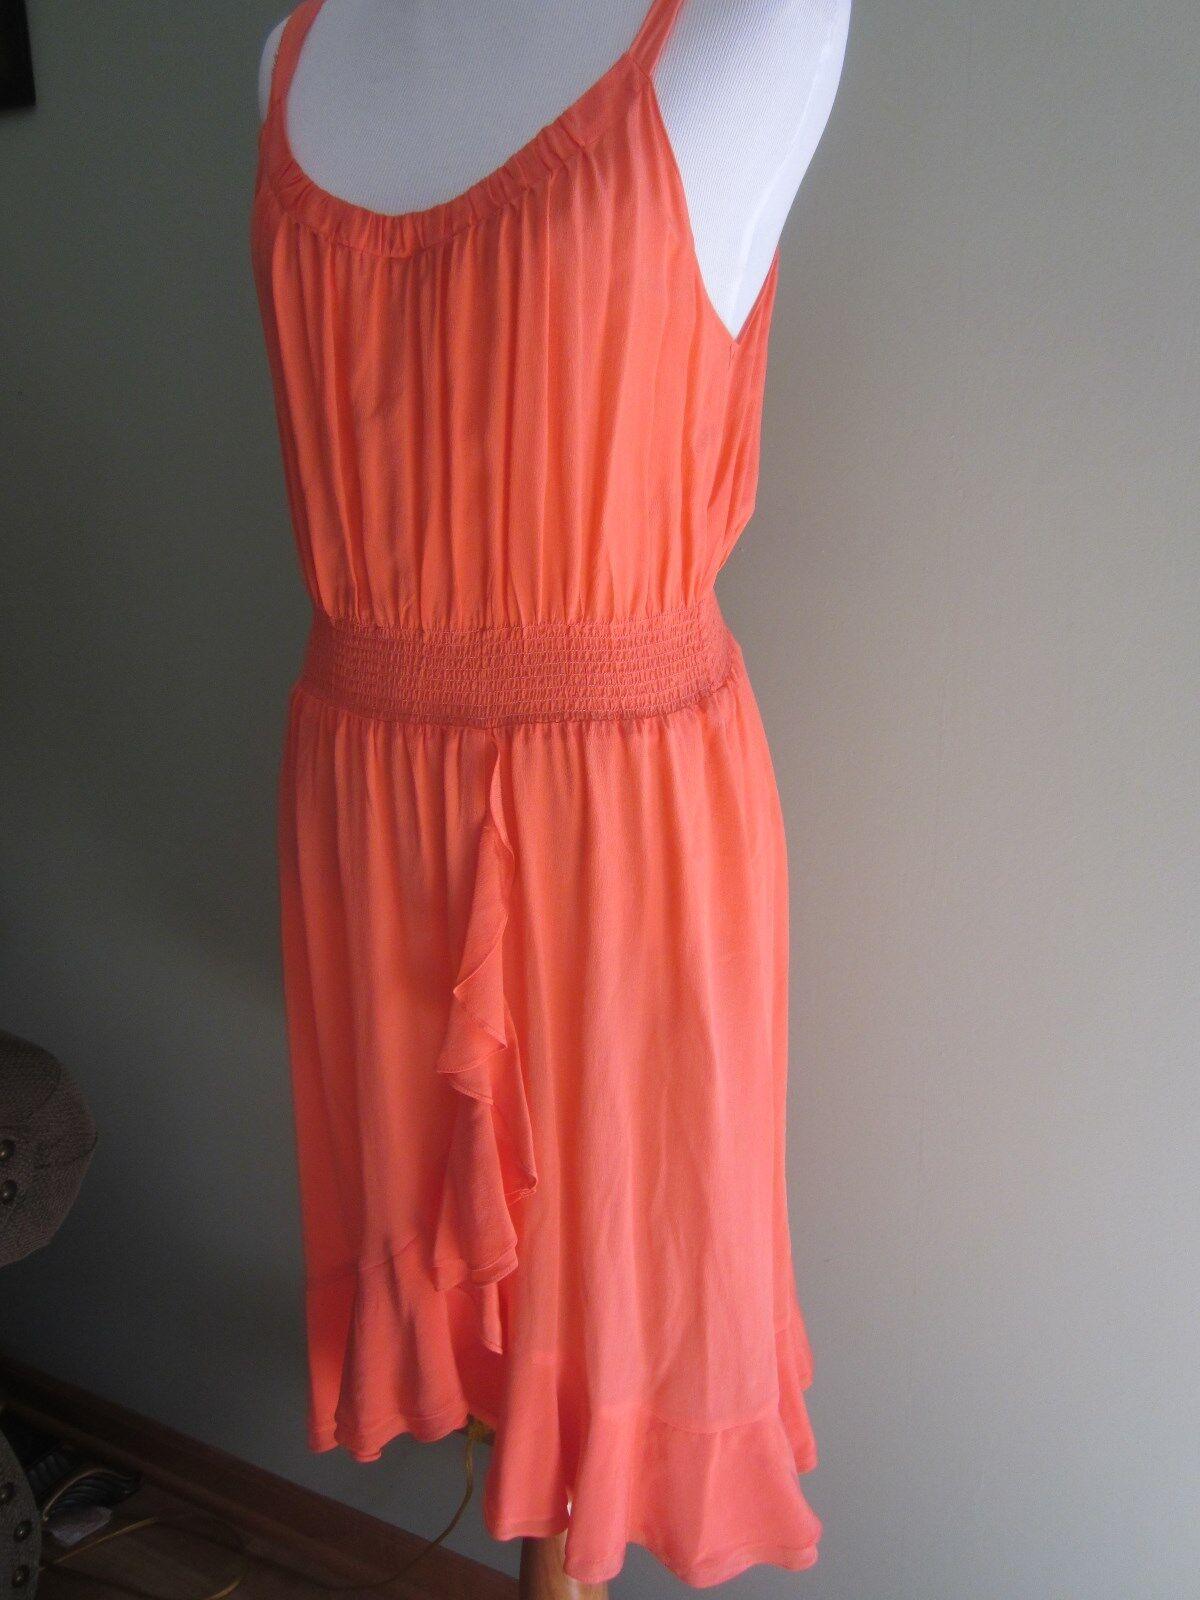 REBECCA TAYLOR SILK RUFFLE CORAL orange DRESS Size 6